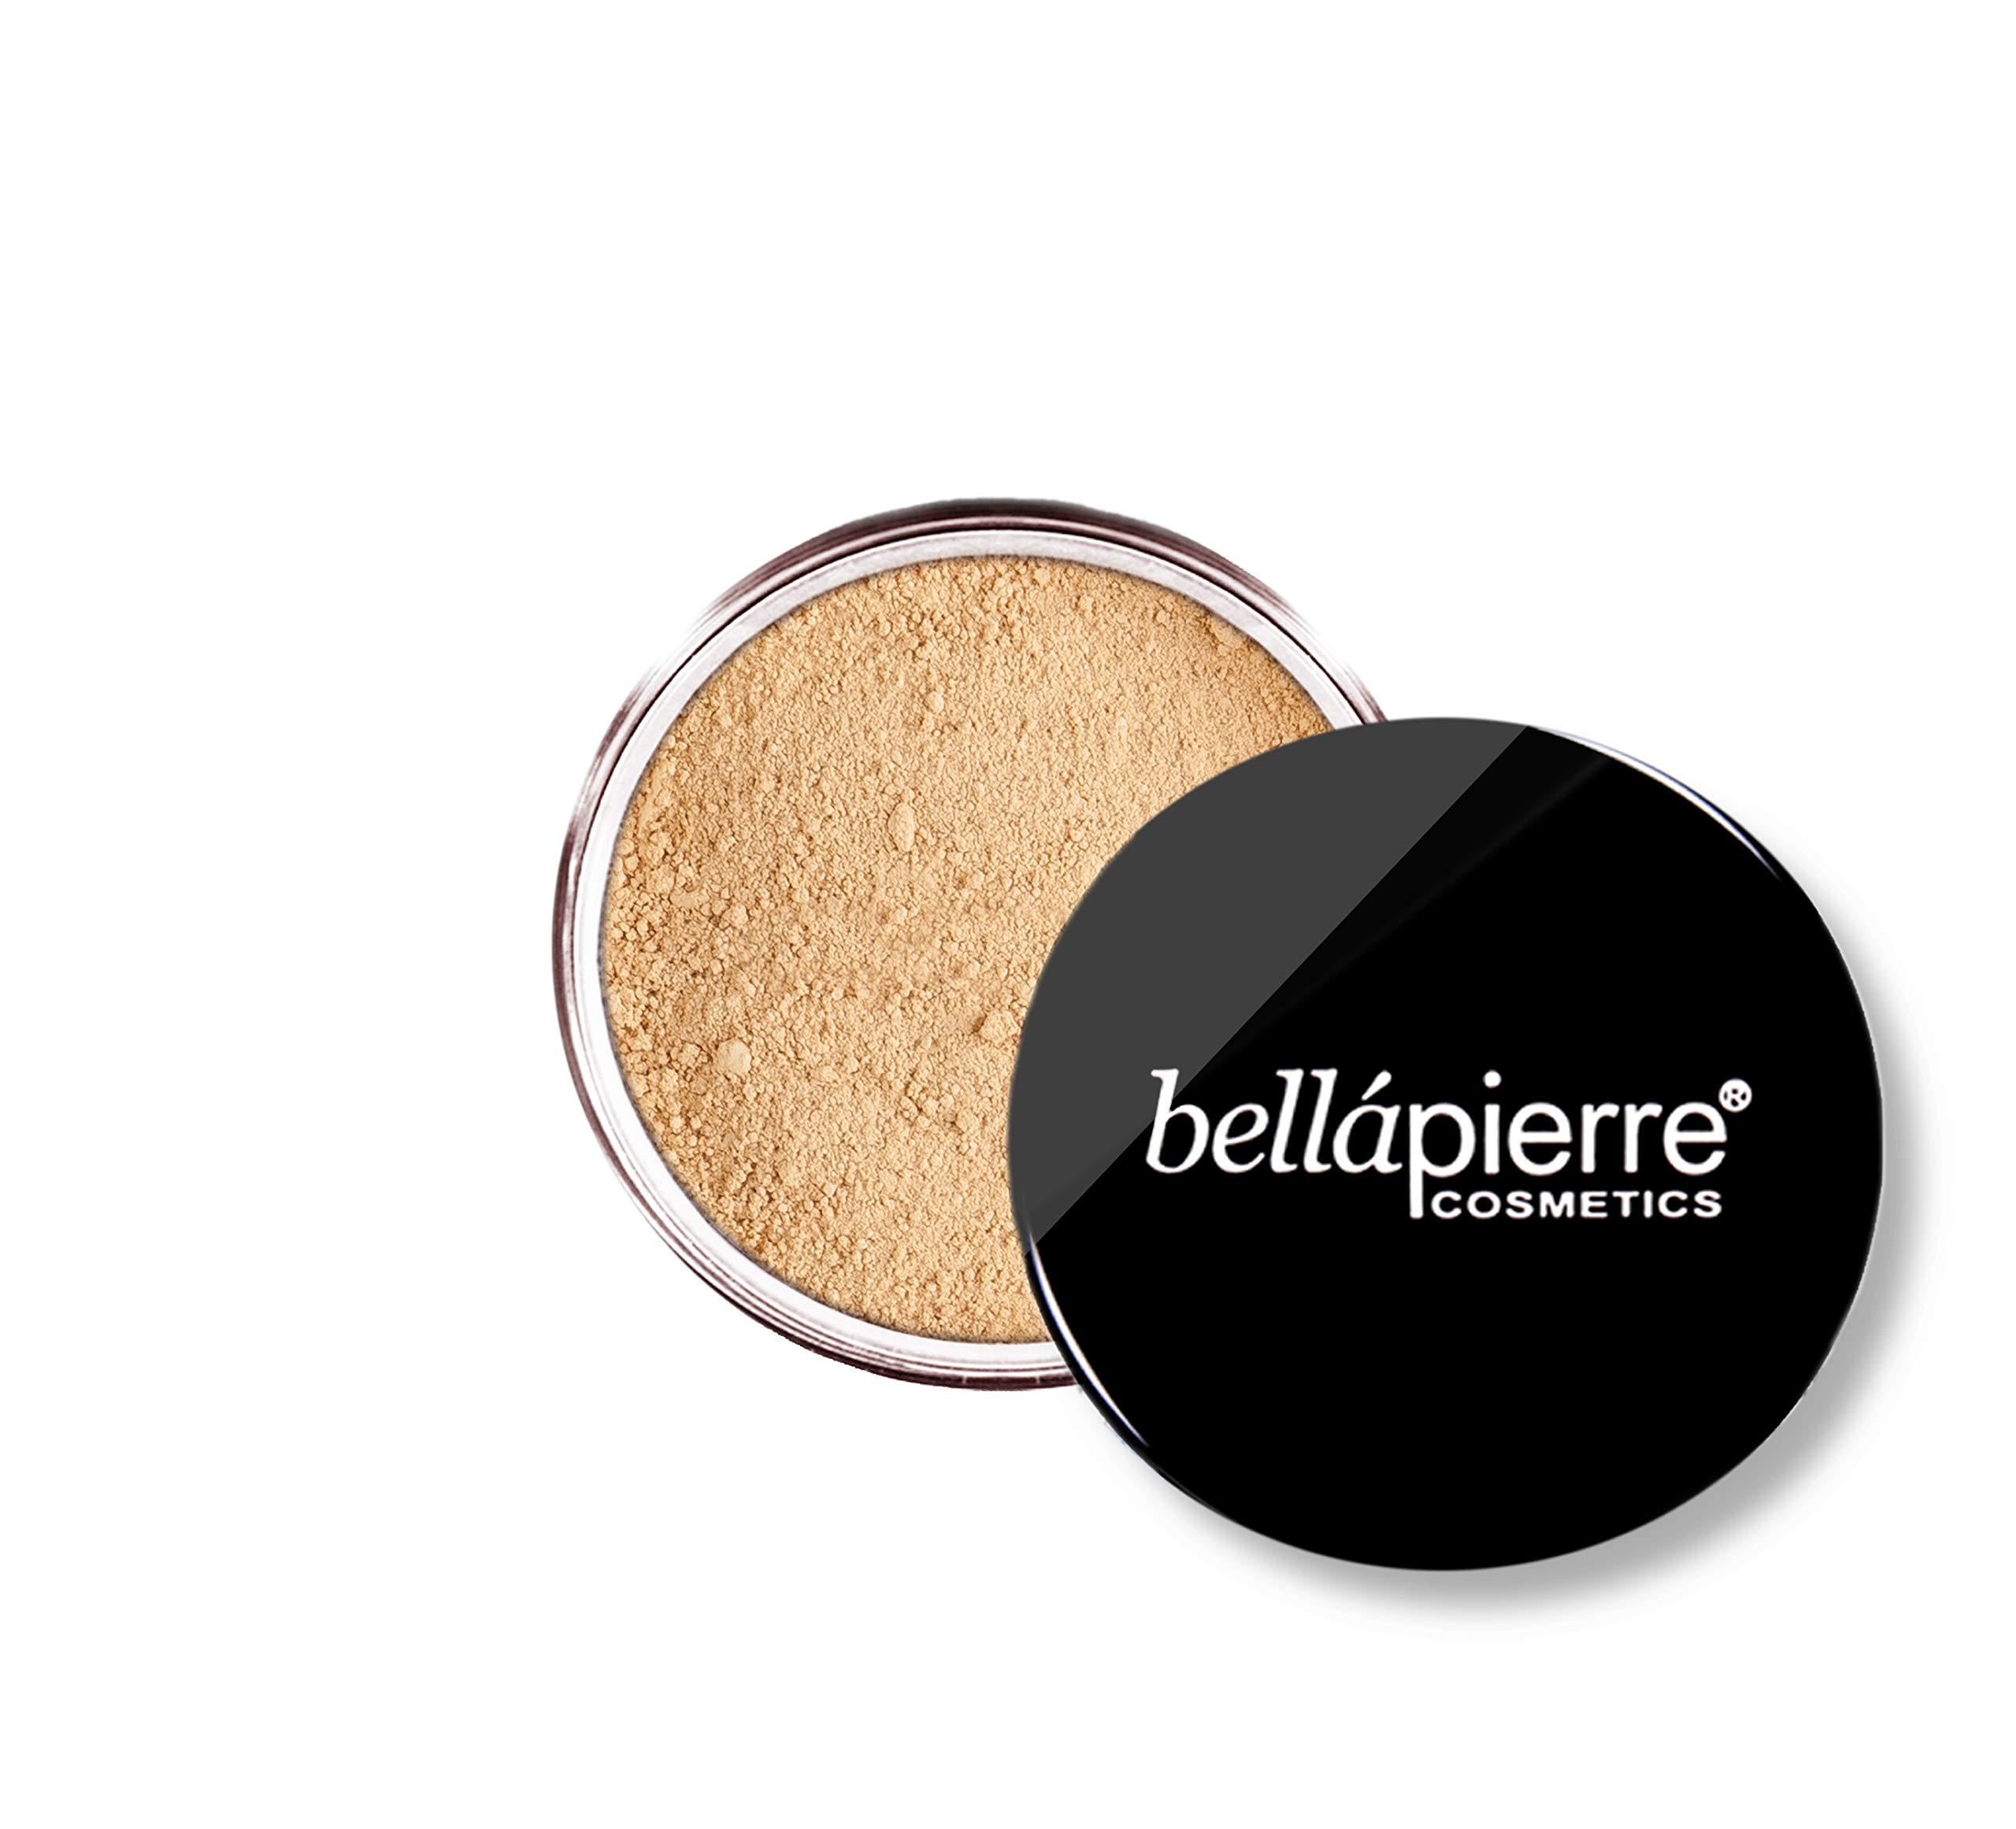 bellapierre Mineral Foundation SPF 15, Loose Powder, Full Coverage - 0.32 Oz. (Nutmeg)